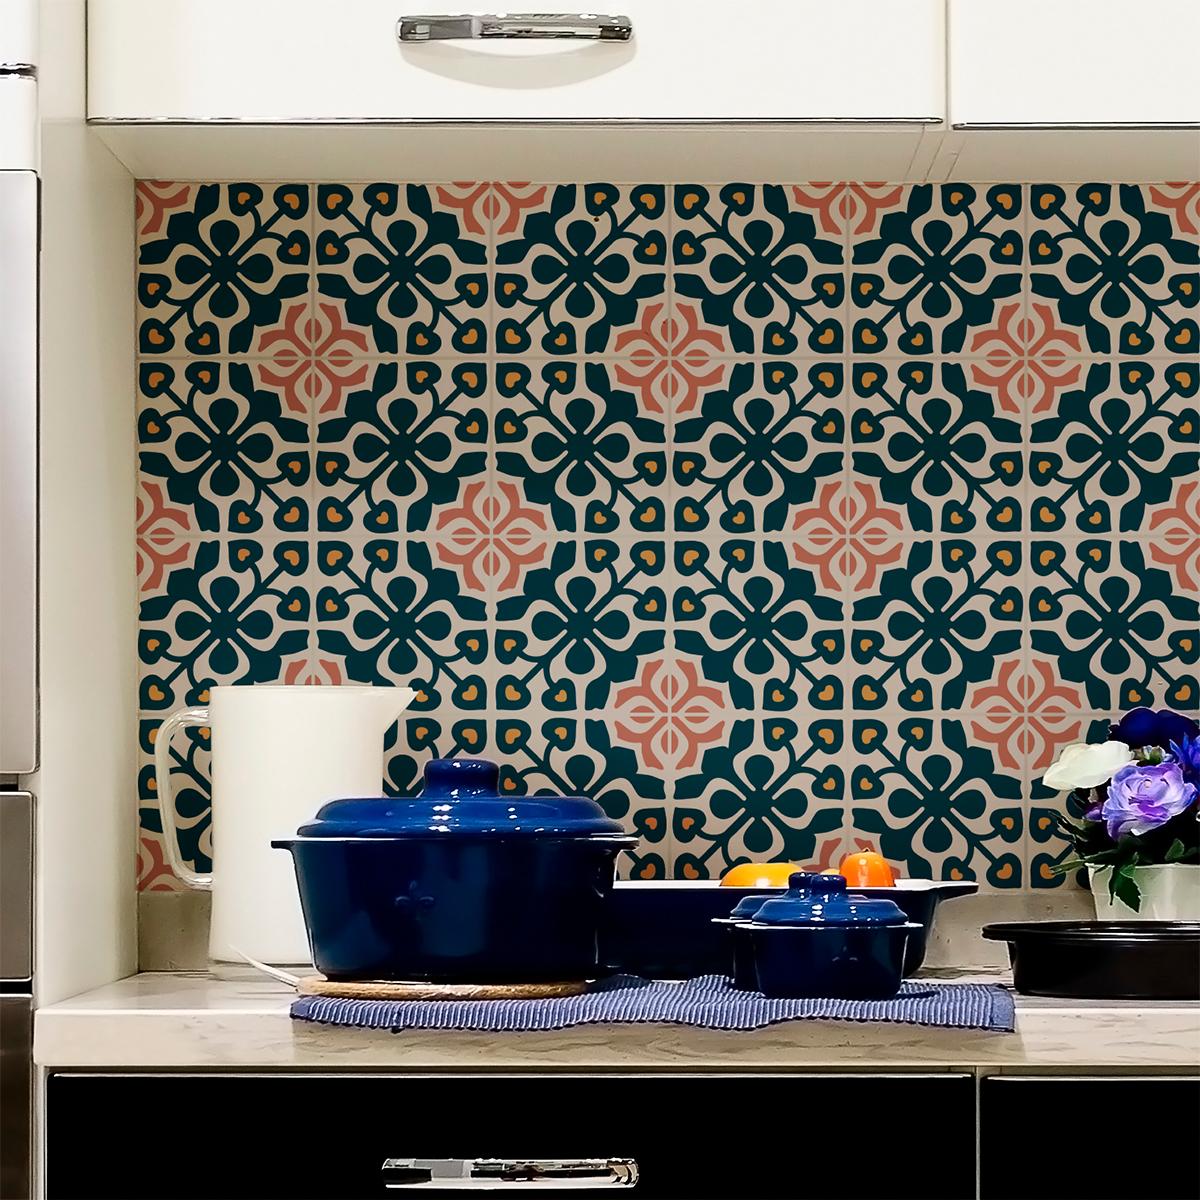 24 stickers carreaux de ciment azulejos callidora. Black Bedroom Furniture Sets. Home Design Ideas